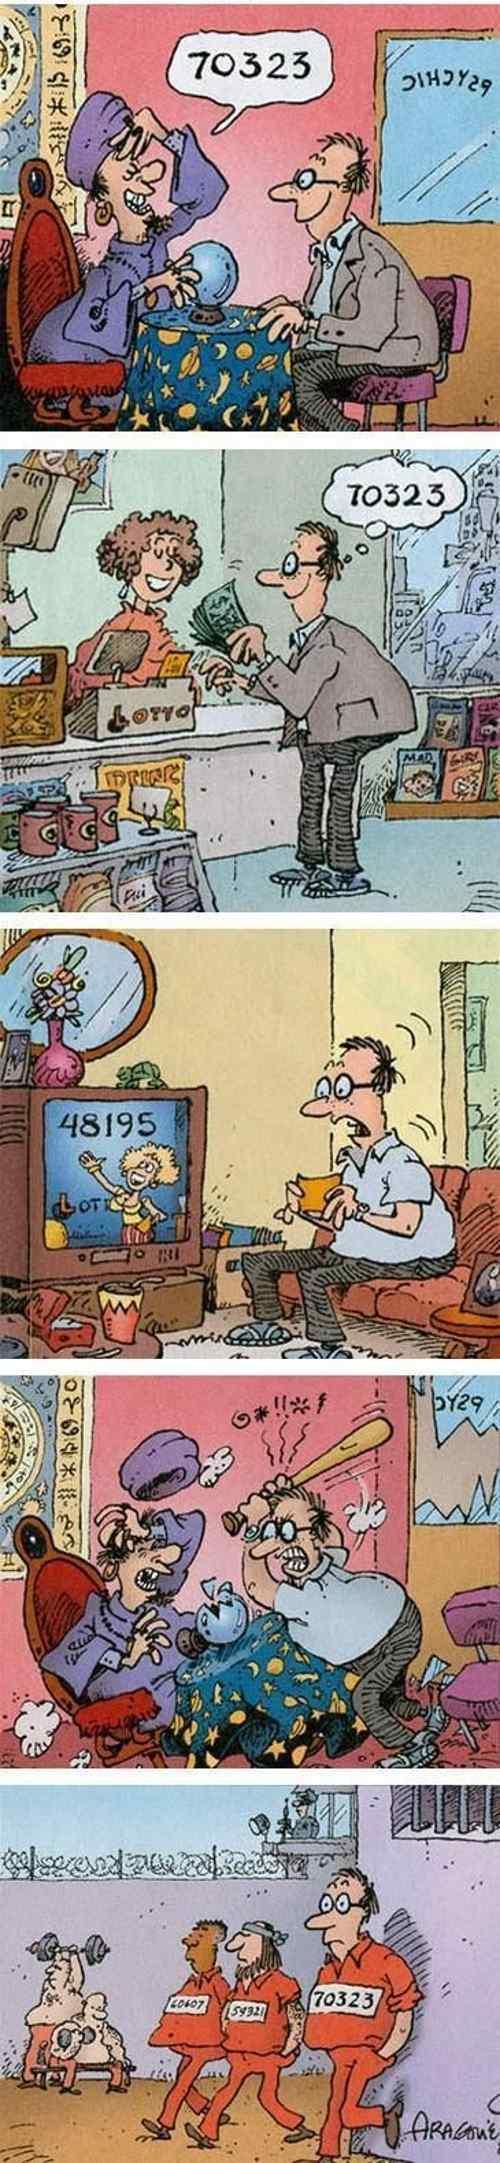 Комикс про судьбу.